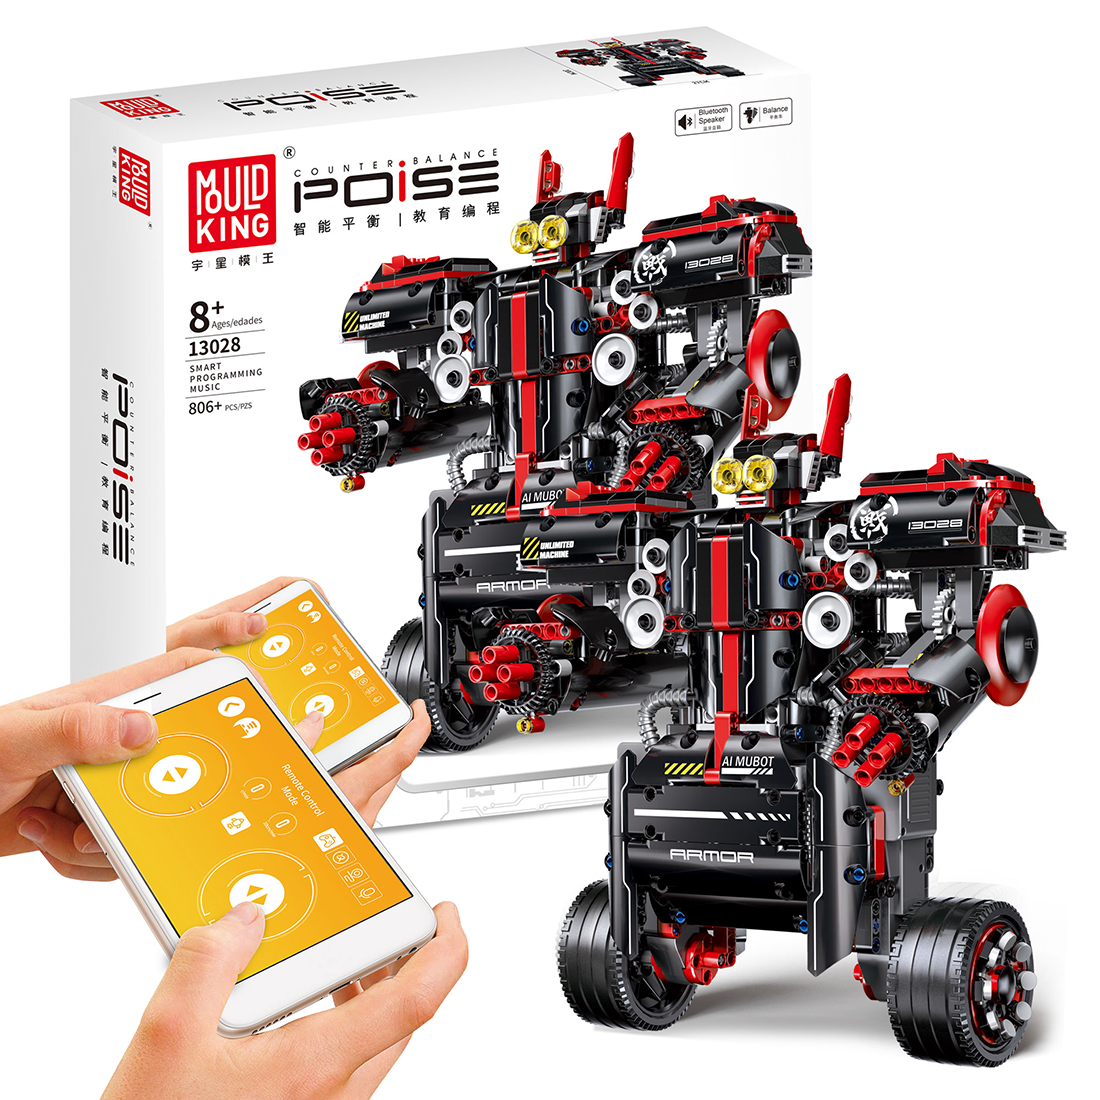 806Pcs/Set With Bluetooth Speaker APP Controlled RC Singing Robot Balanced Programming Robot Building Construction Kit - Black